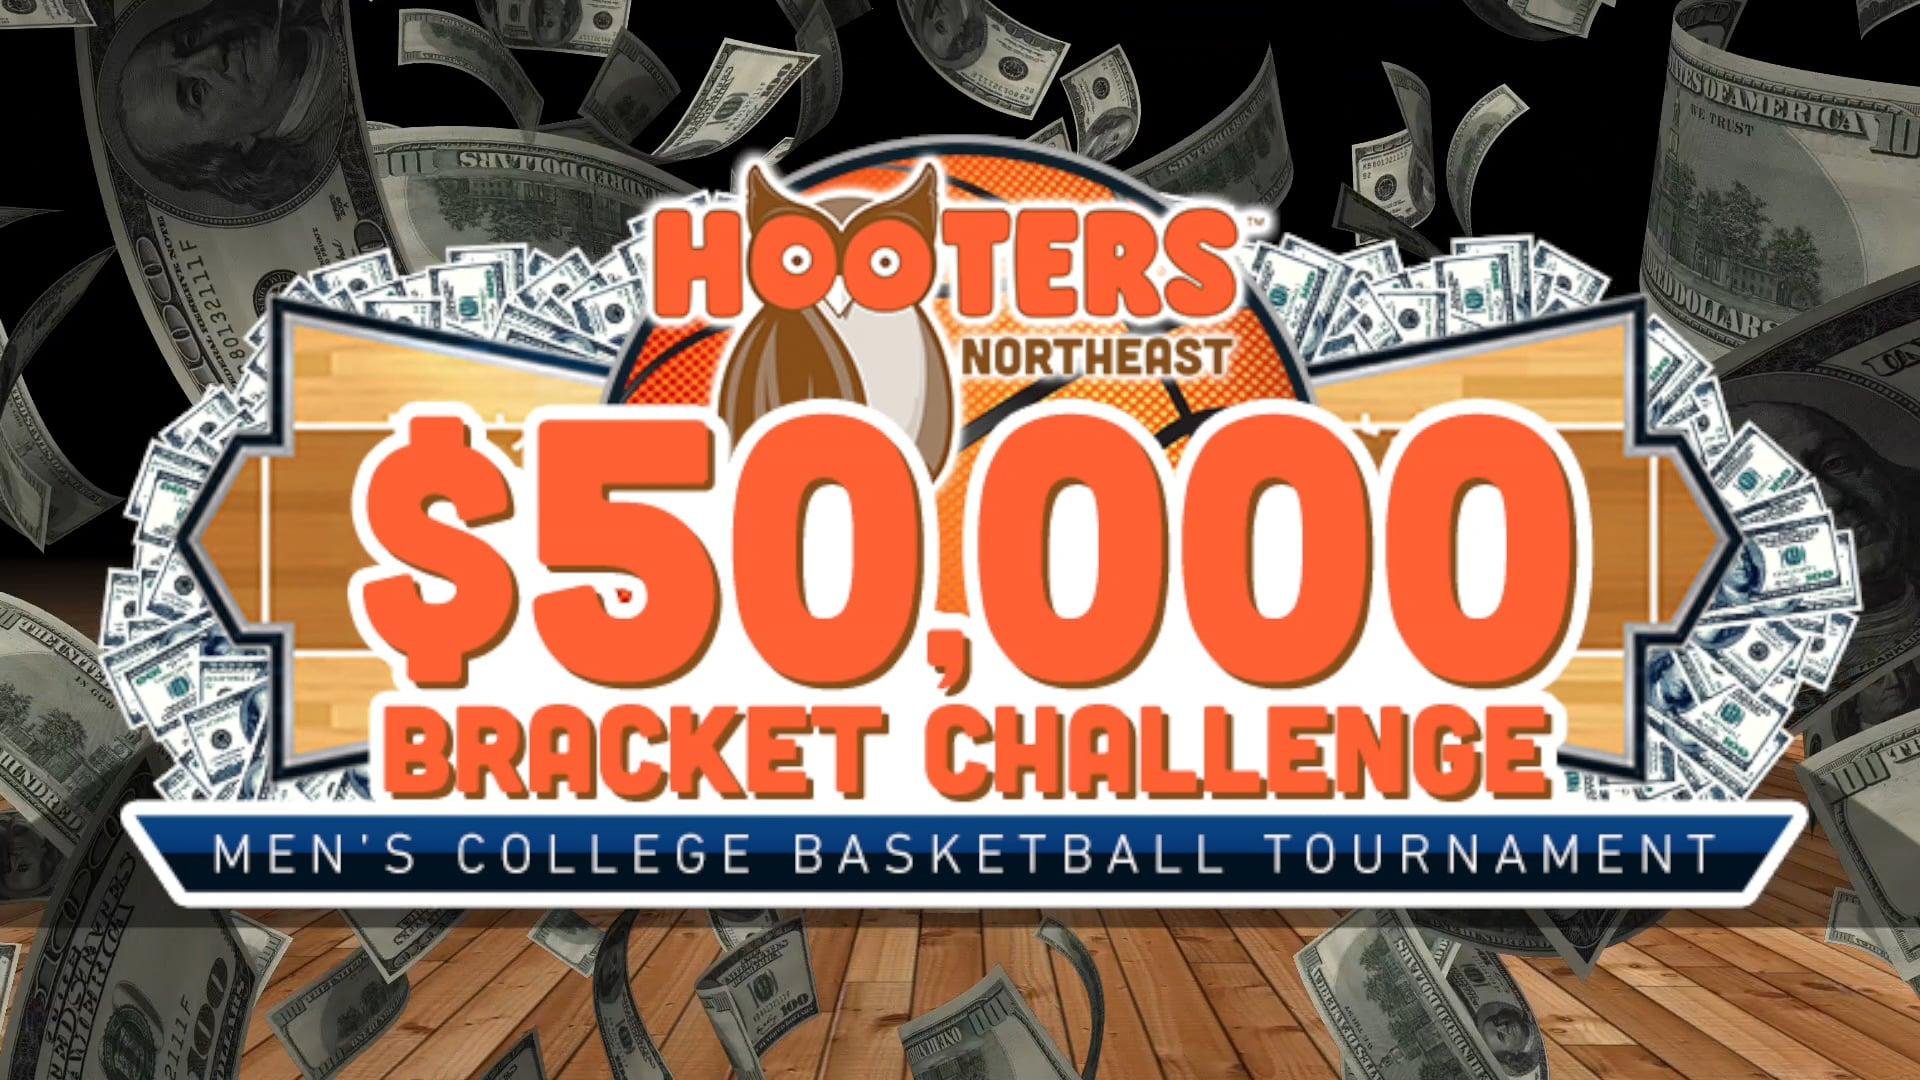 Hooters Bracket Challenge